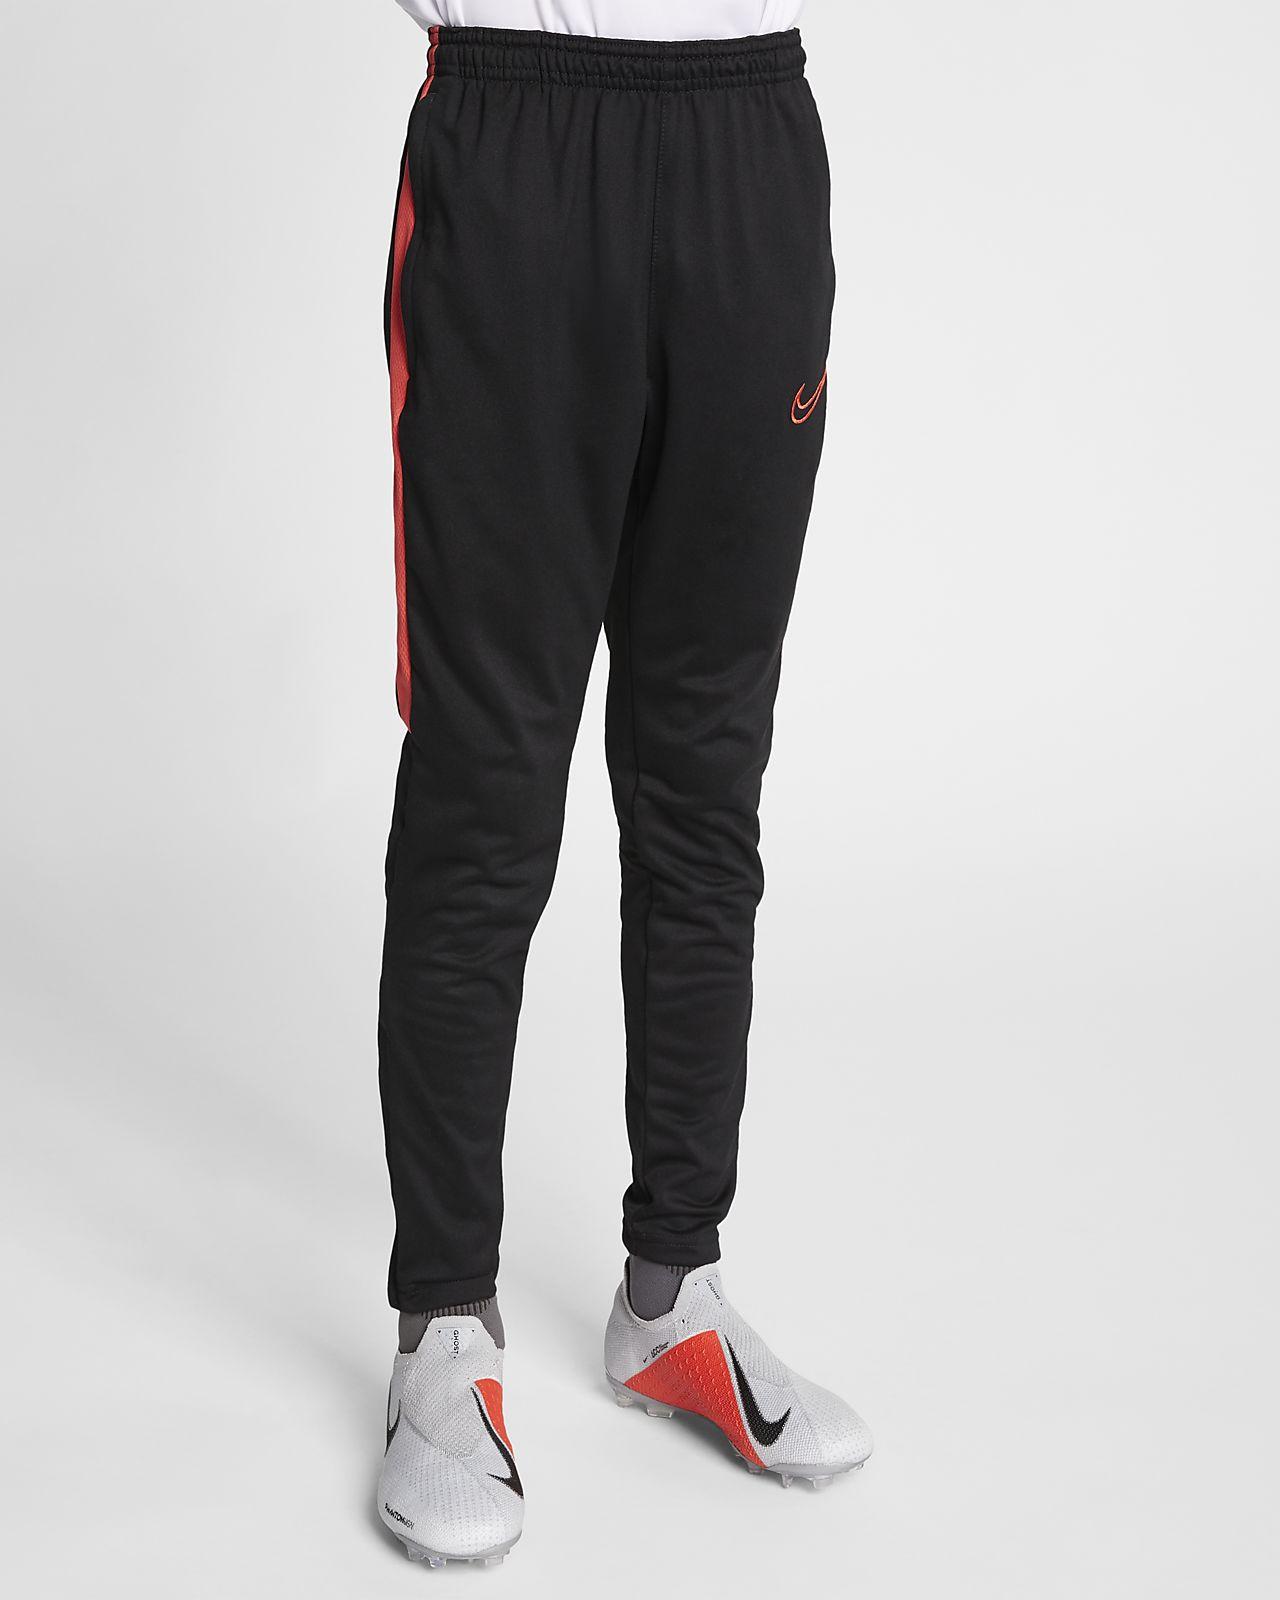 Nike Dri-FIT Academy Pantalón de fútbol - Niño a. Nike.com ES c682d859873a6